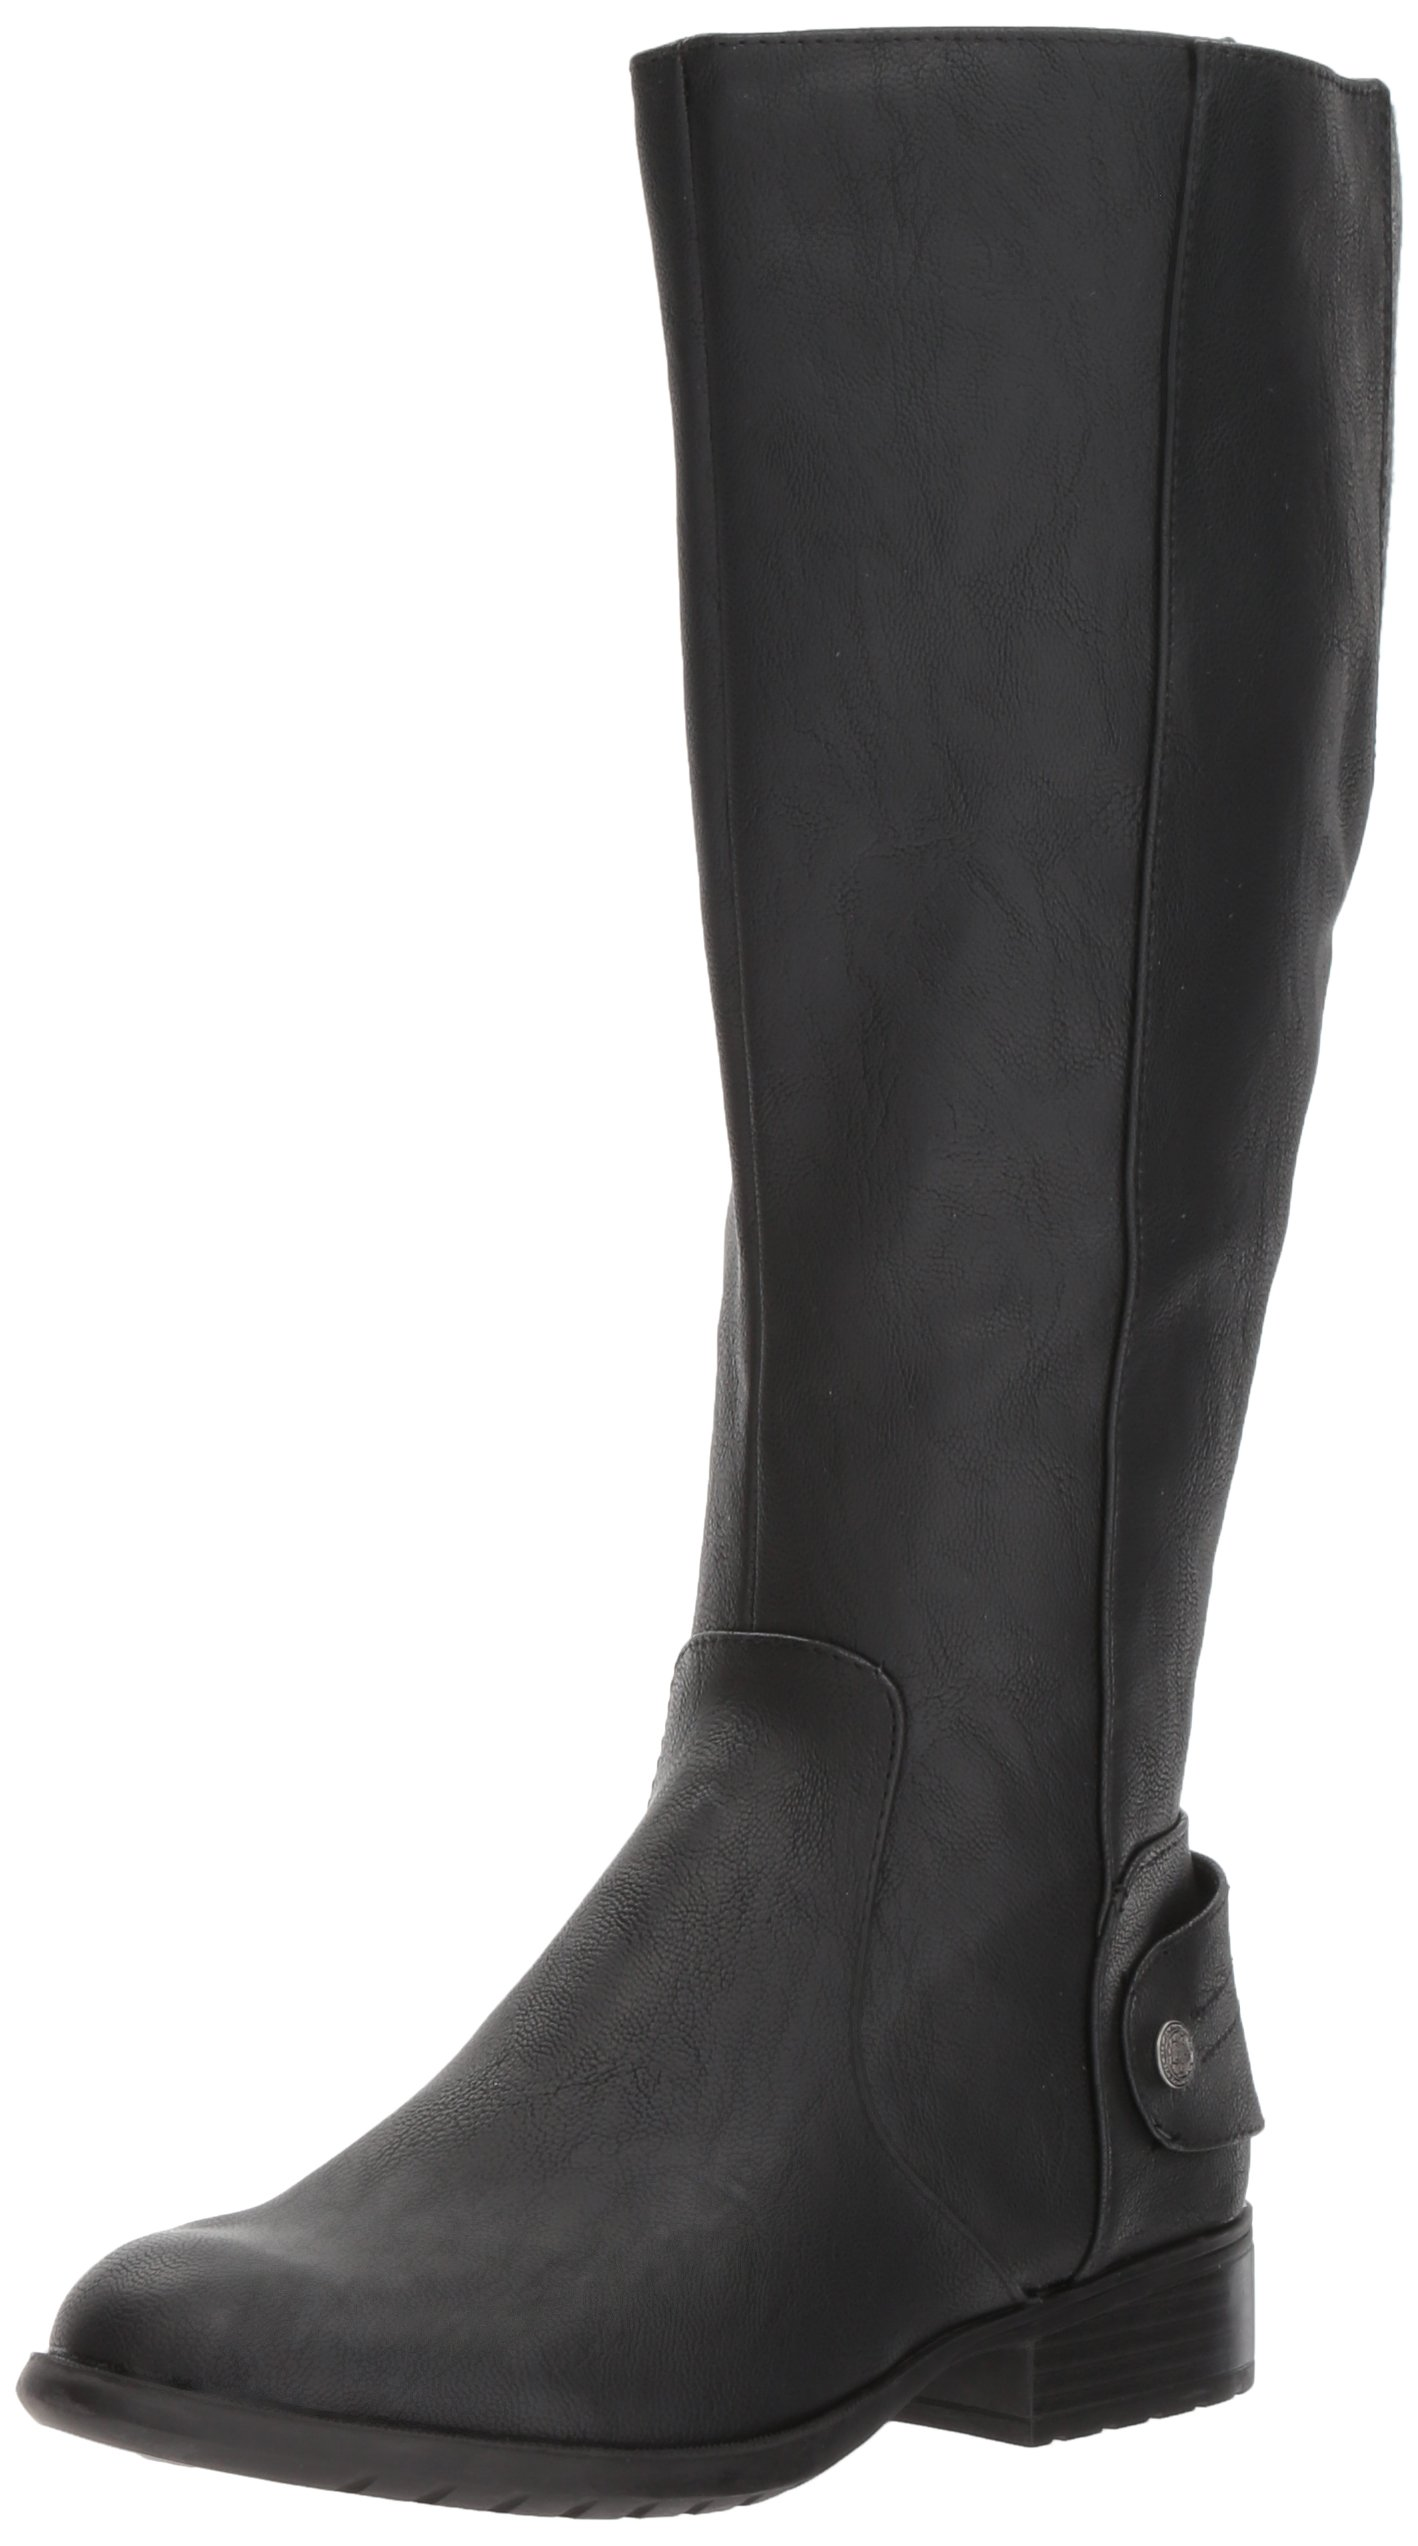 LifeStride Women's Xandy Equestrian Boot, Black, 9 W US